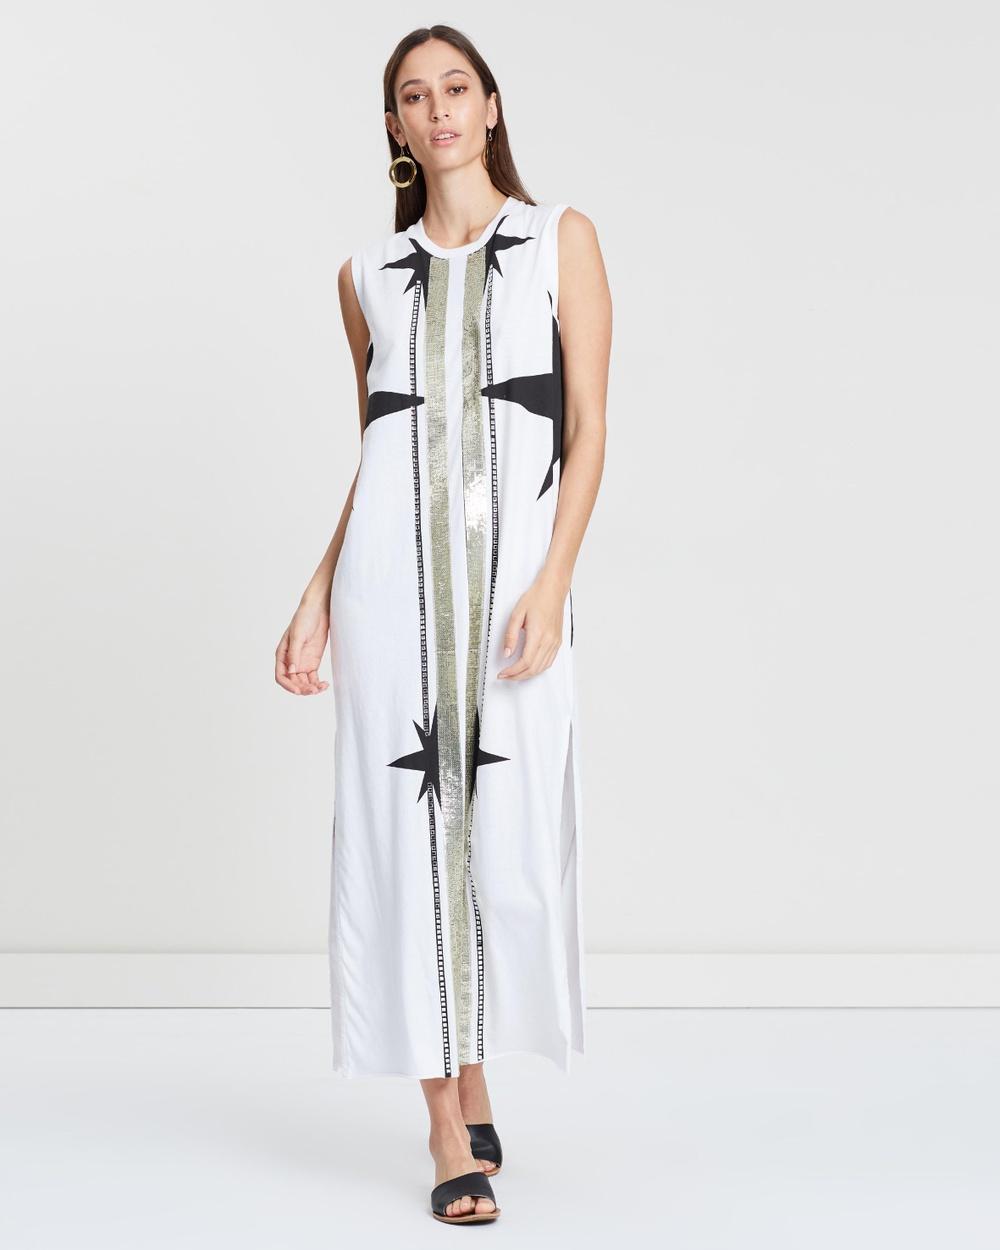 Sass & Bide Ivory Society High Dress